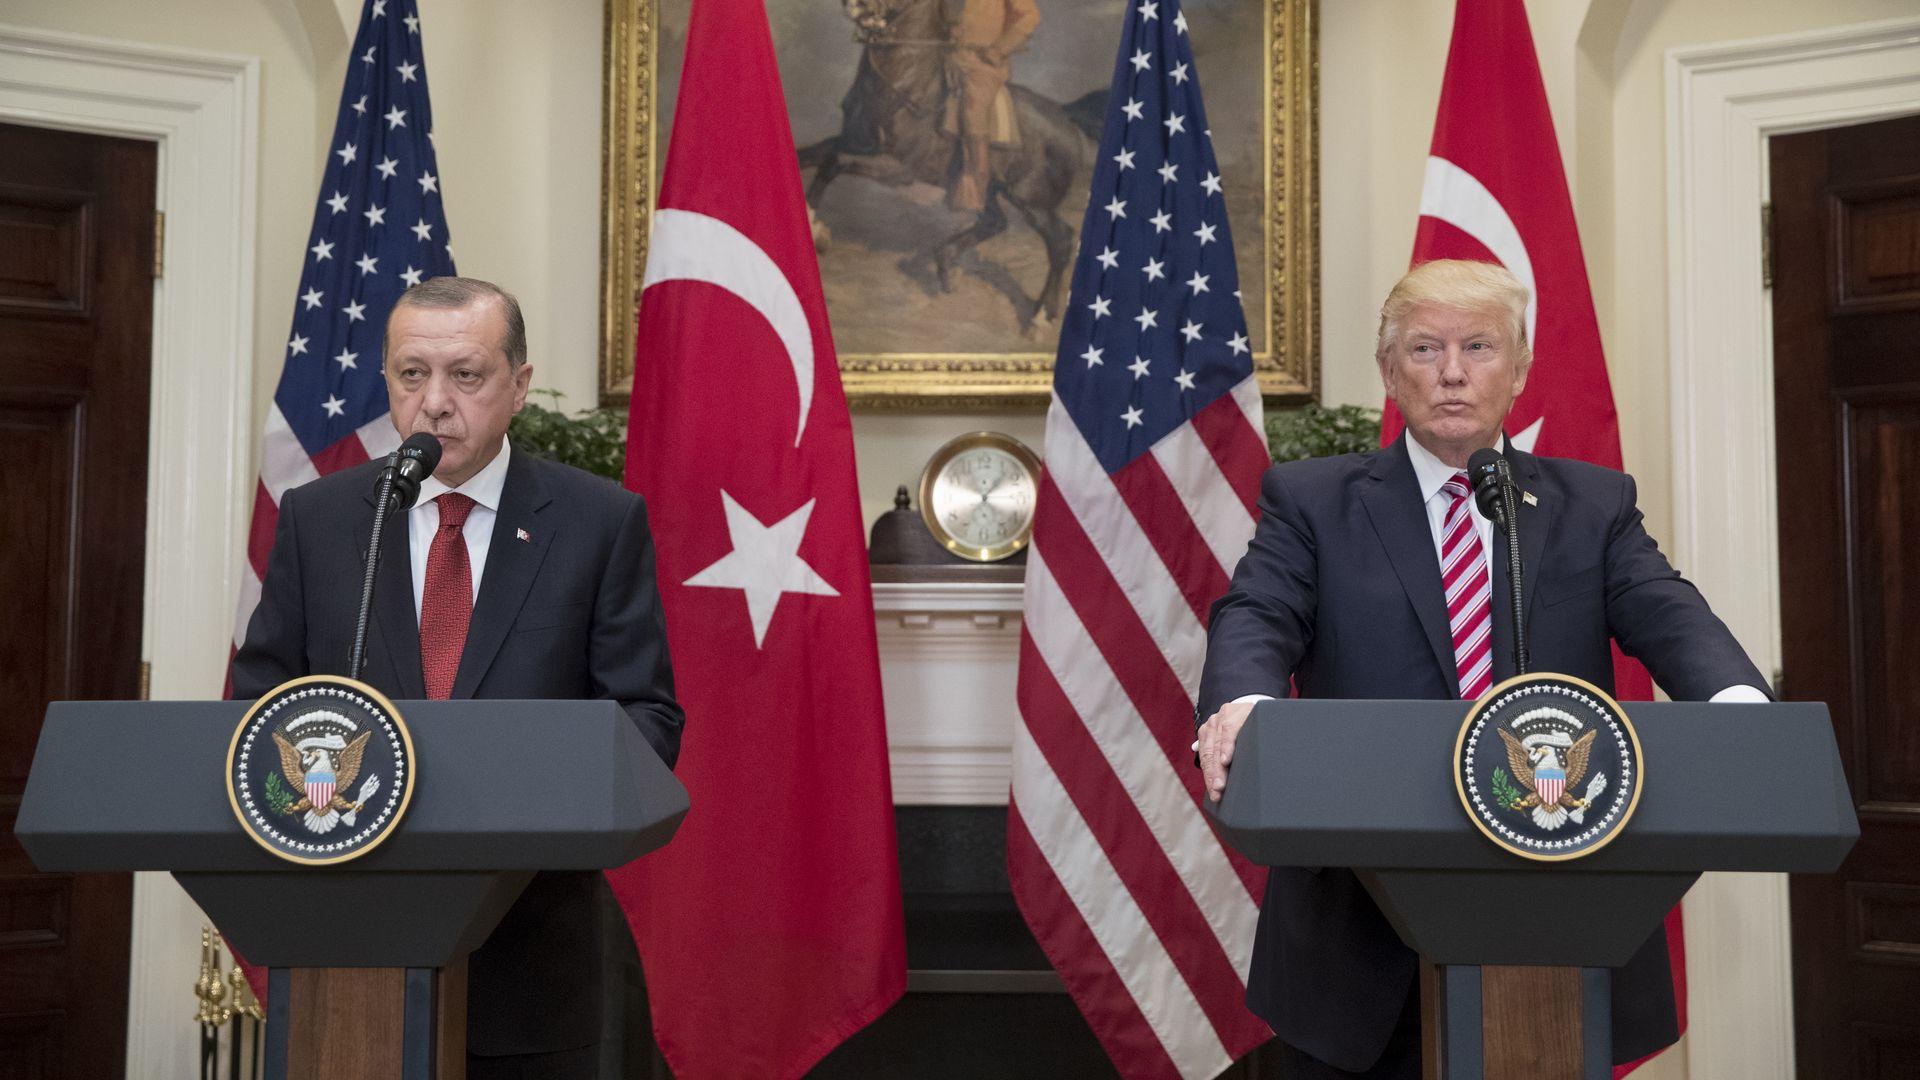 US President Donald J. Trump and President of Turkey Recep Tayyip Erdogan